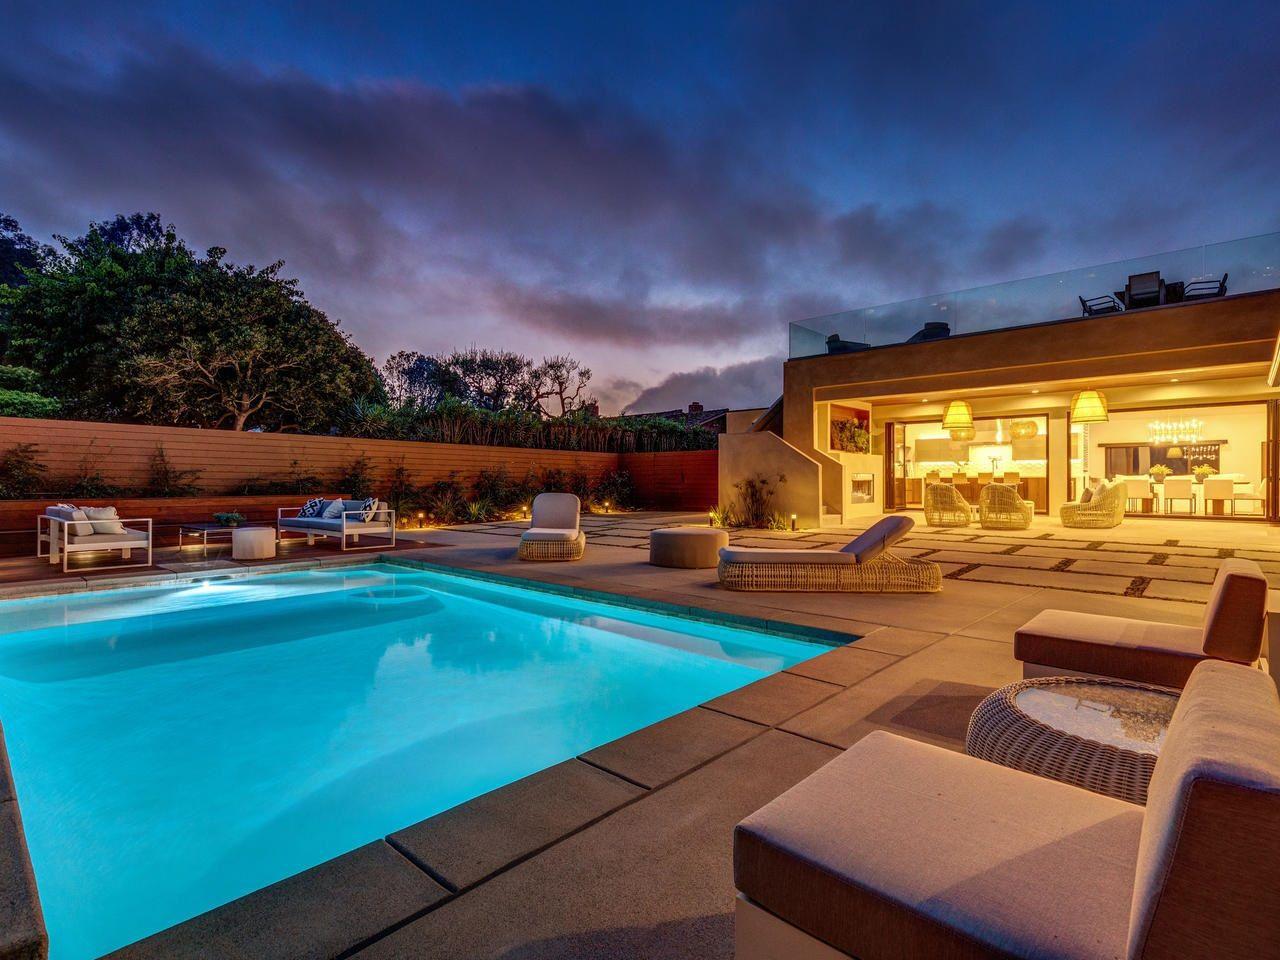 Main Photo: LA JOLLA House for sale : 4 bedrooms : 2345 Via Siena